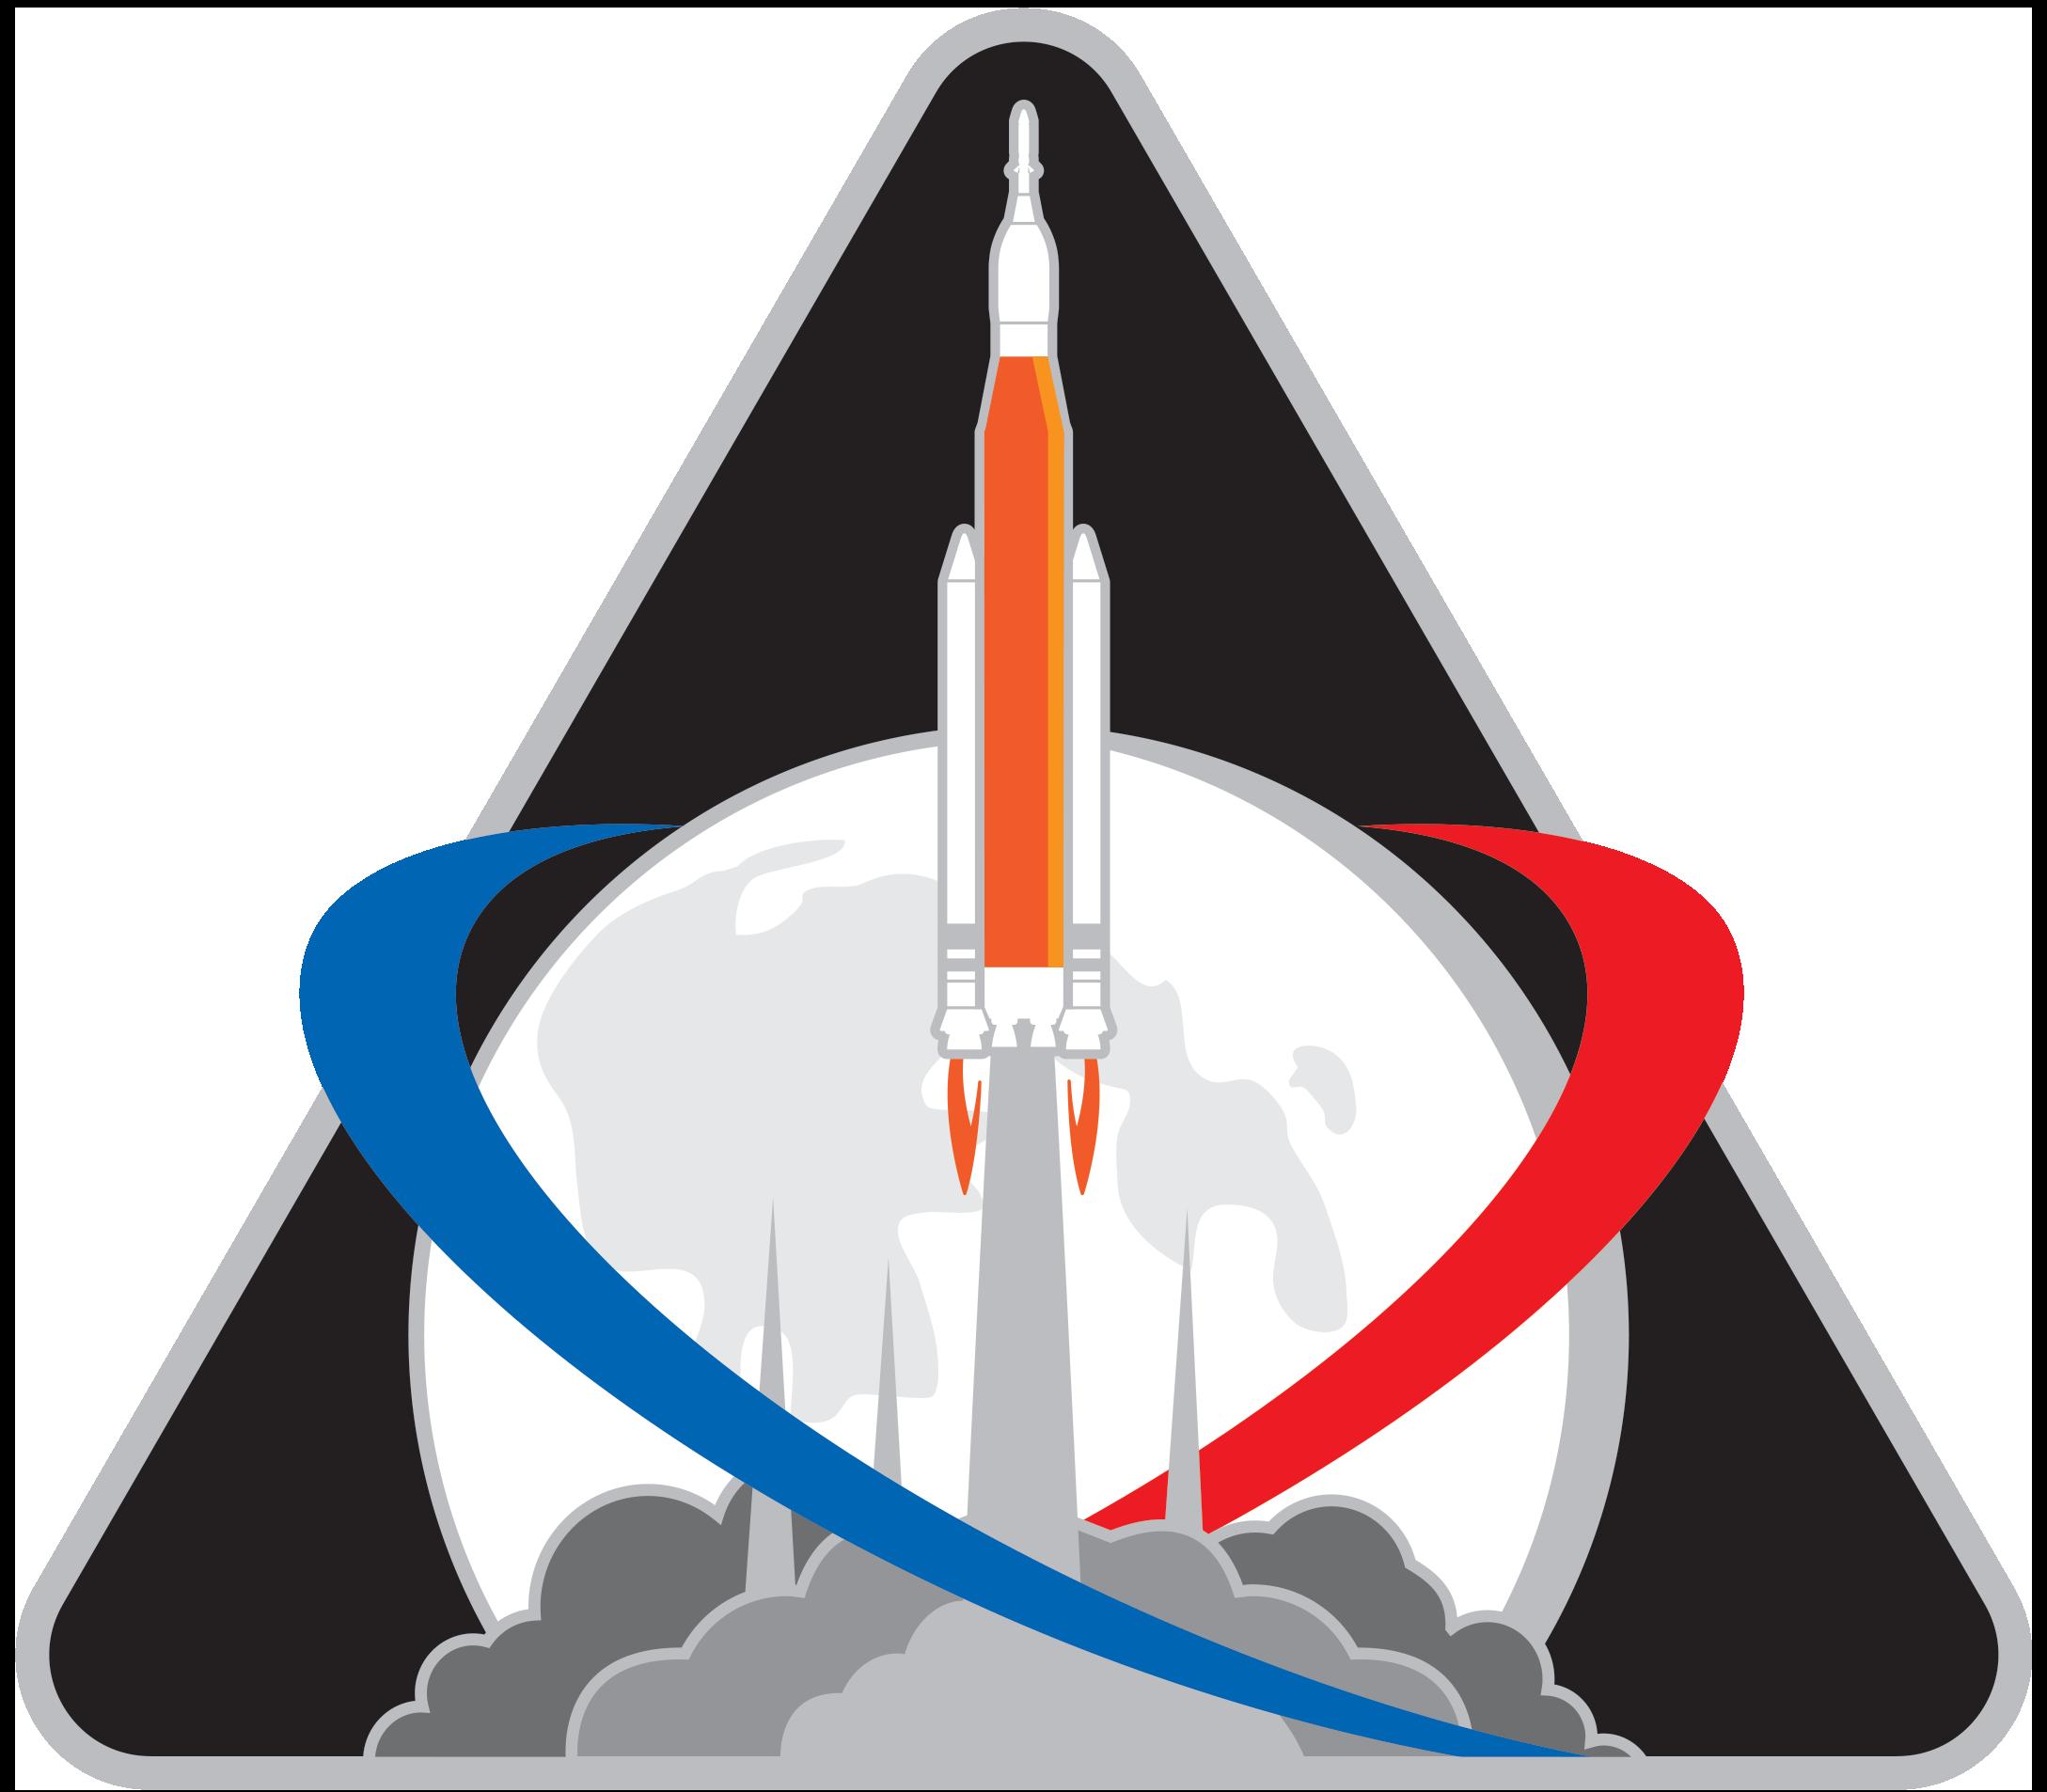 Artemis 1 - Wikipedia